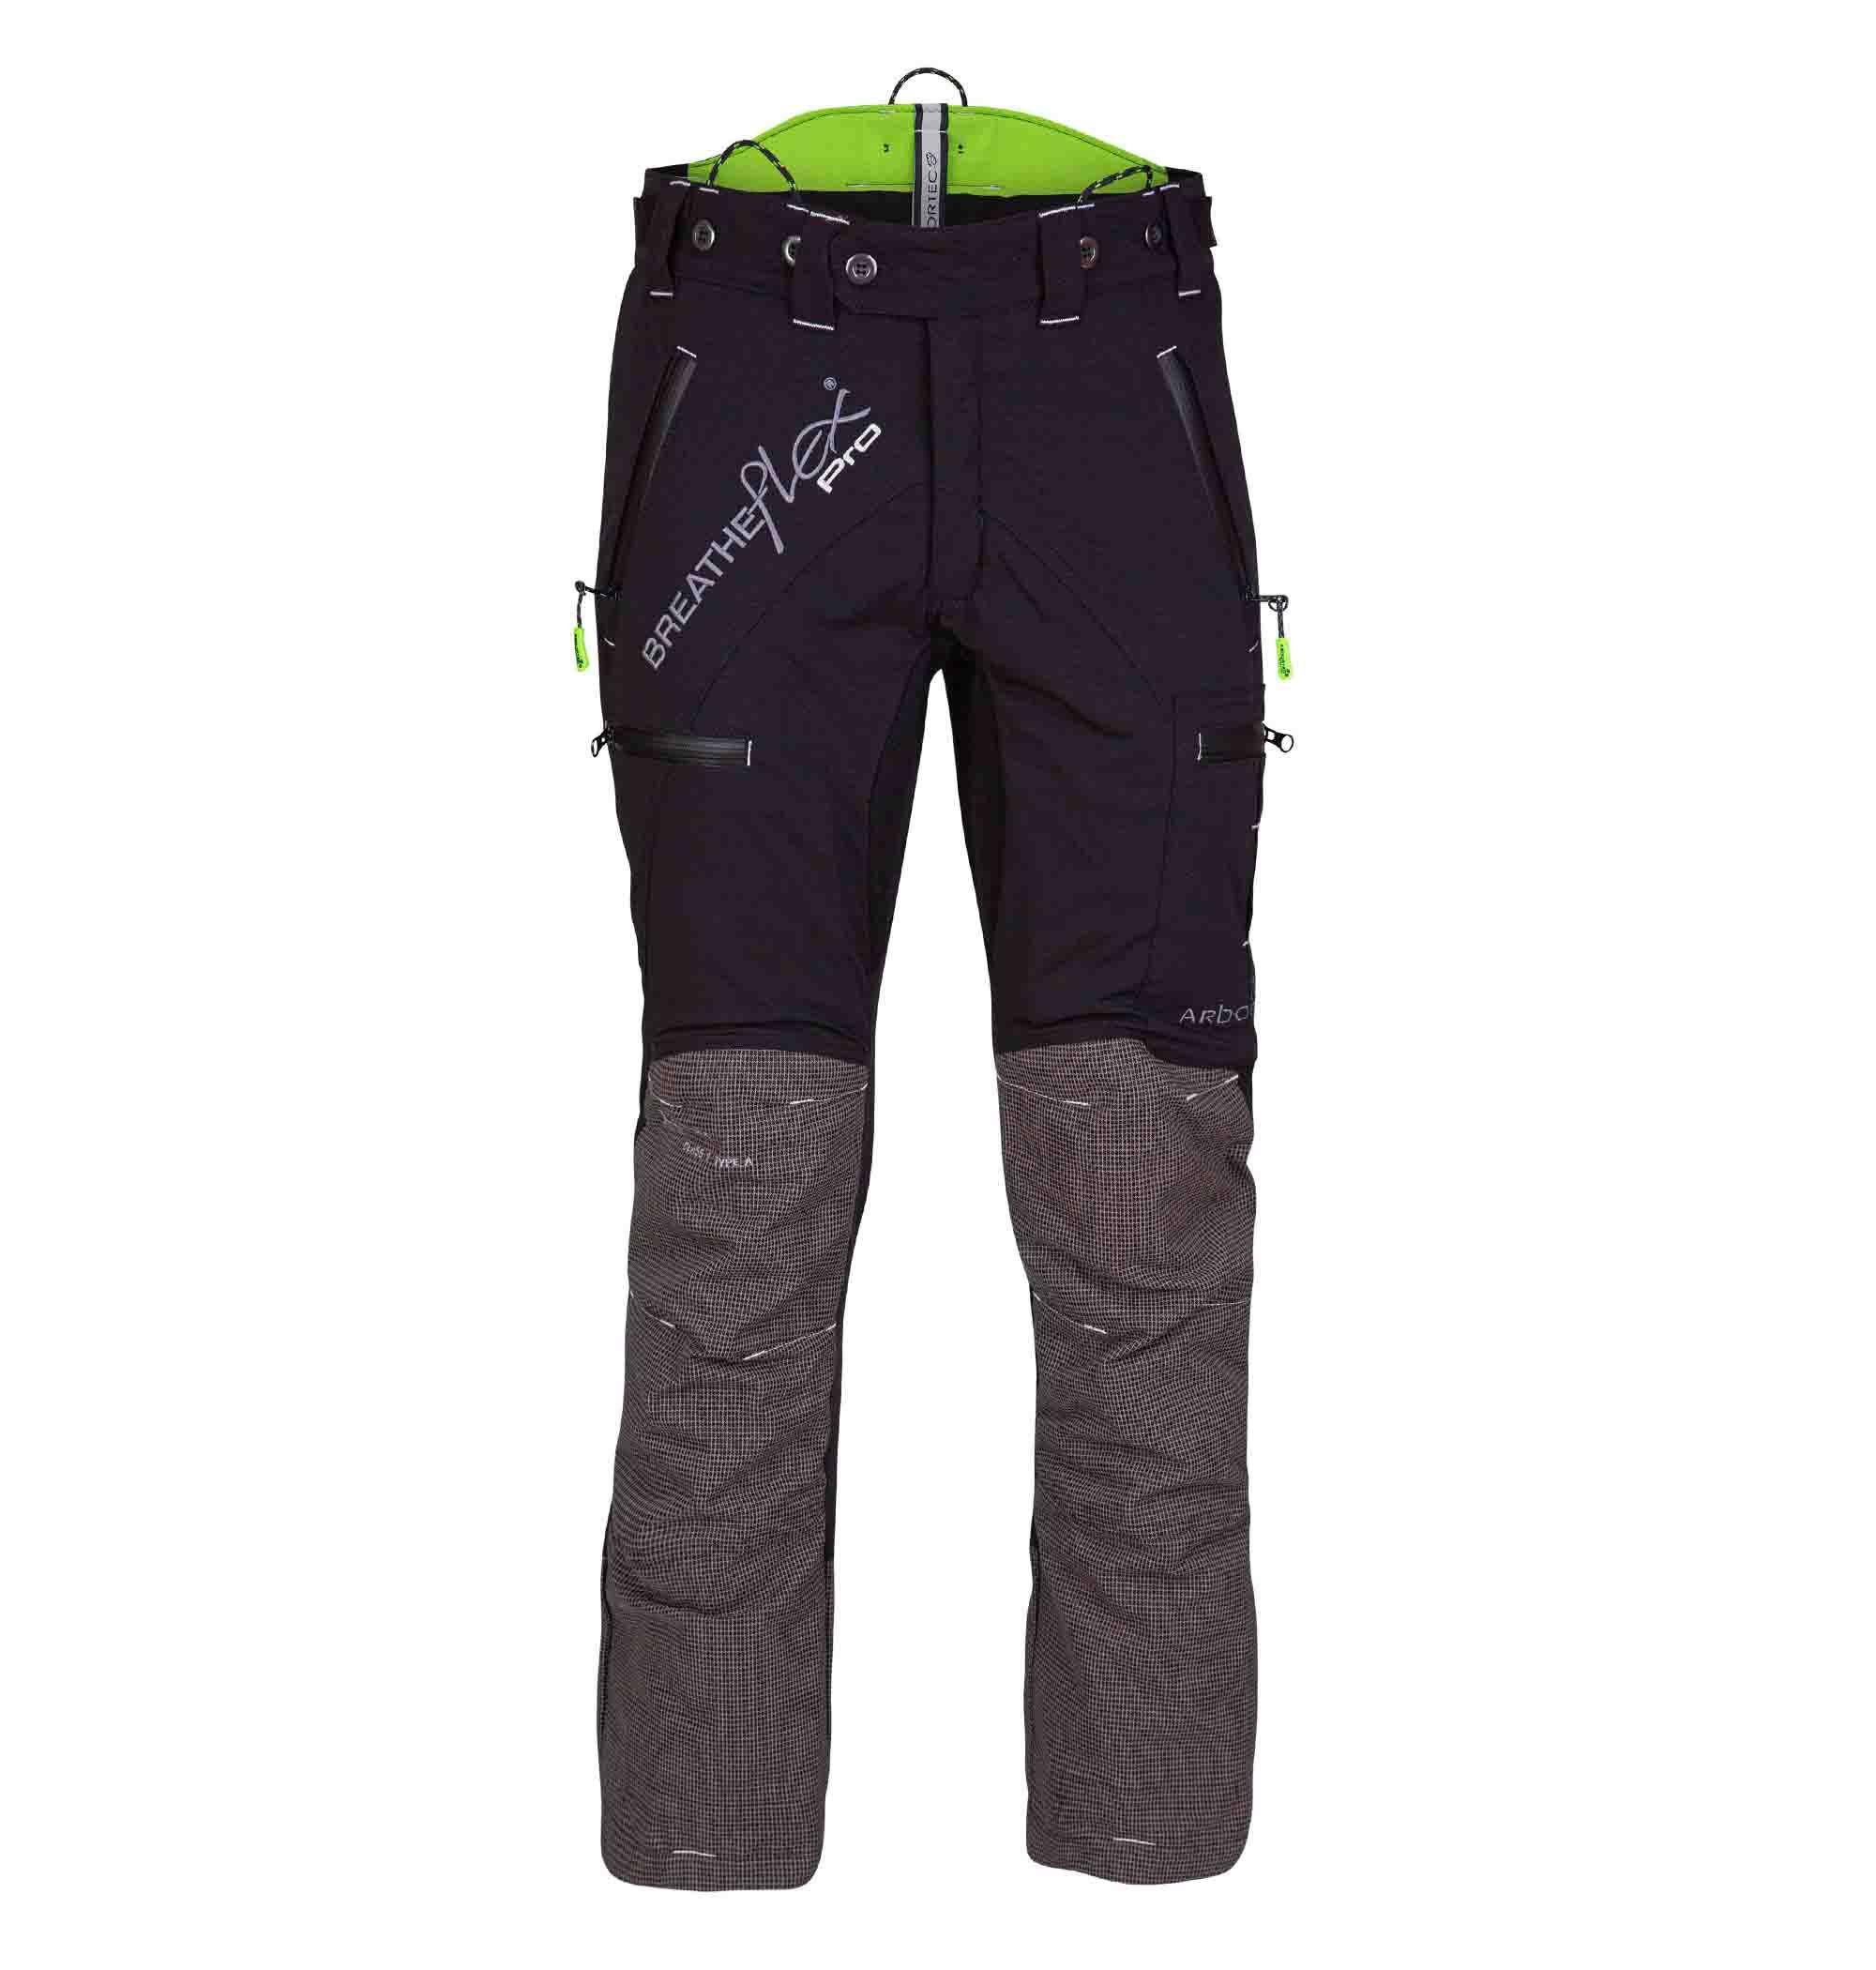 Arbortec AT4070 BreatheFlex Chain Saw Trousers Type C Class 1 Black